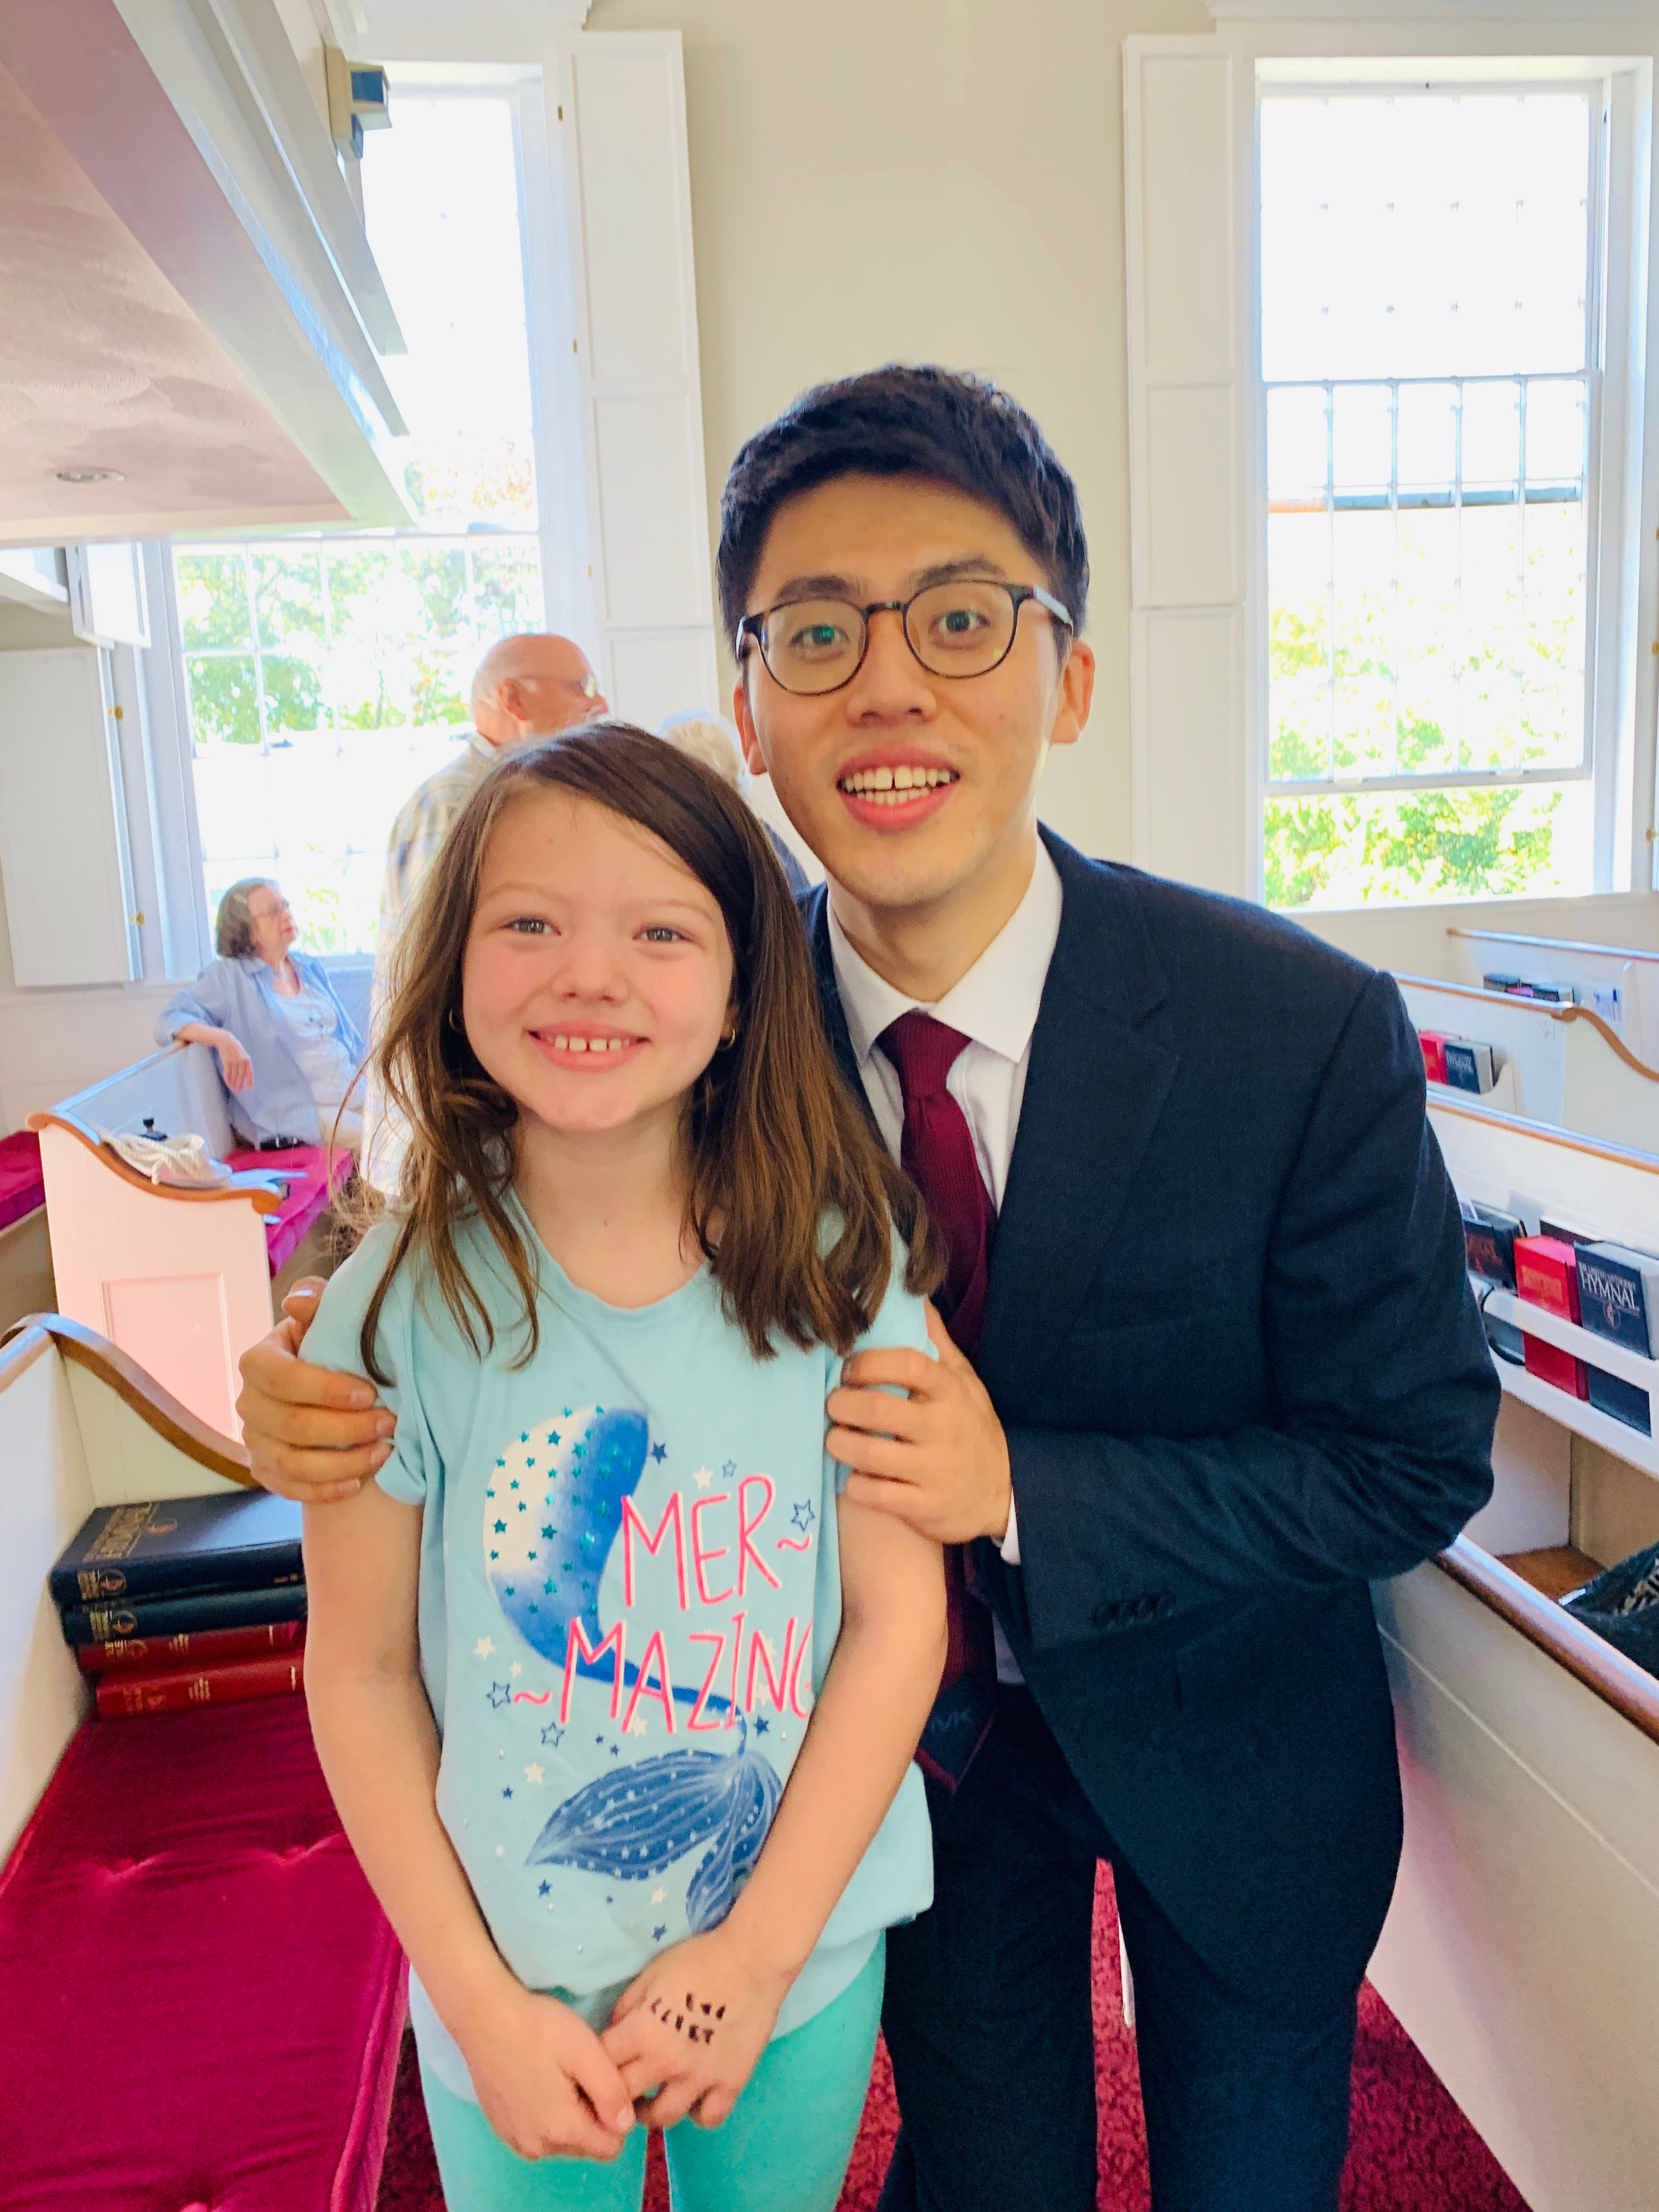 09.15.2019 (First Sunday school)